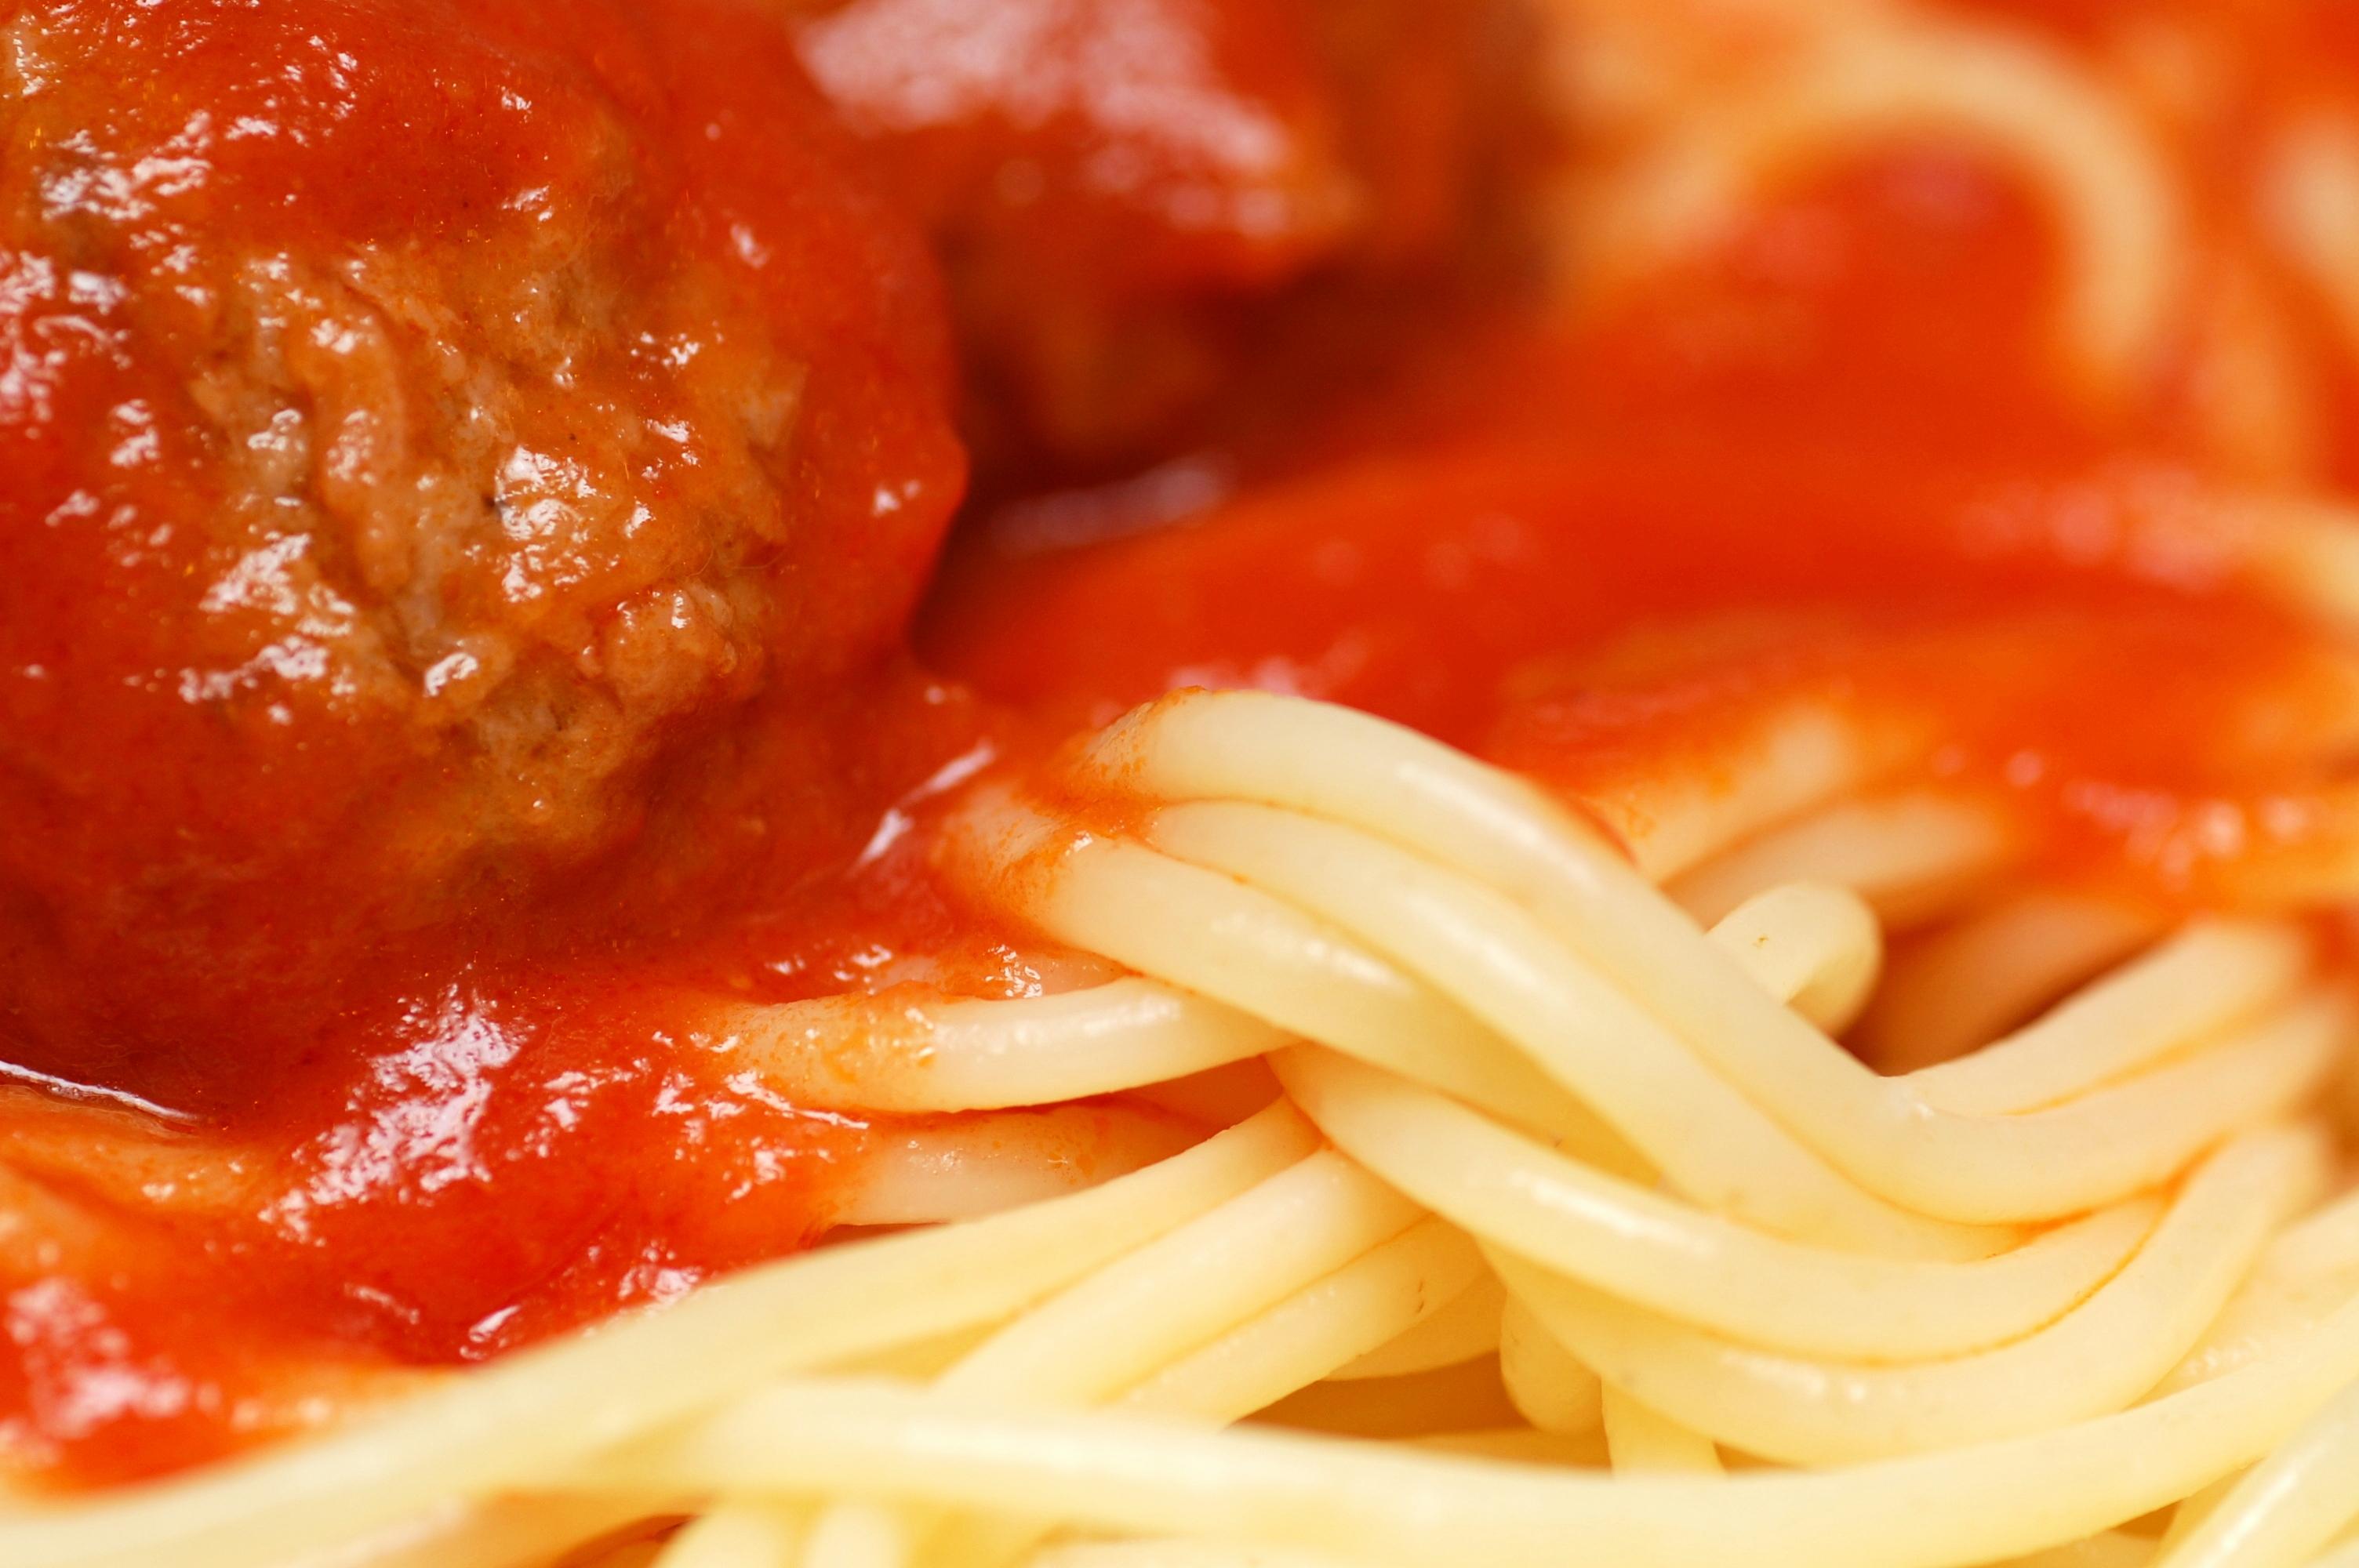 English: Spaghetti and Meatballs